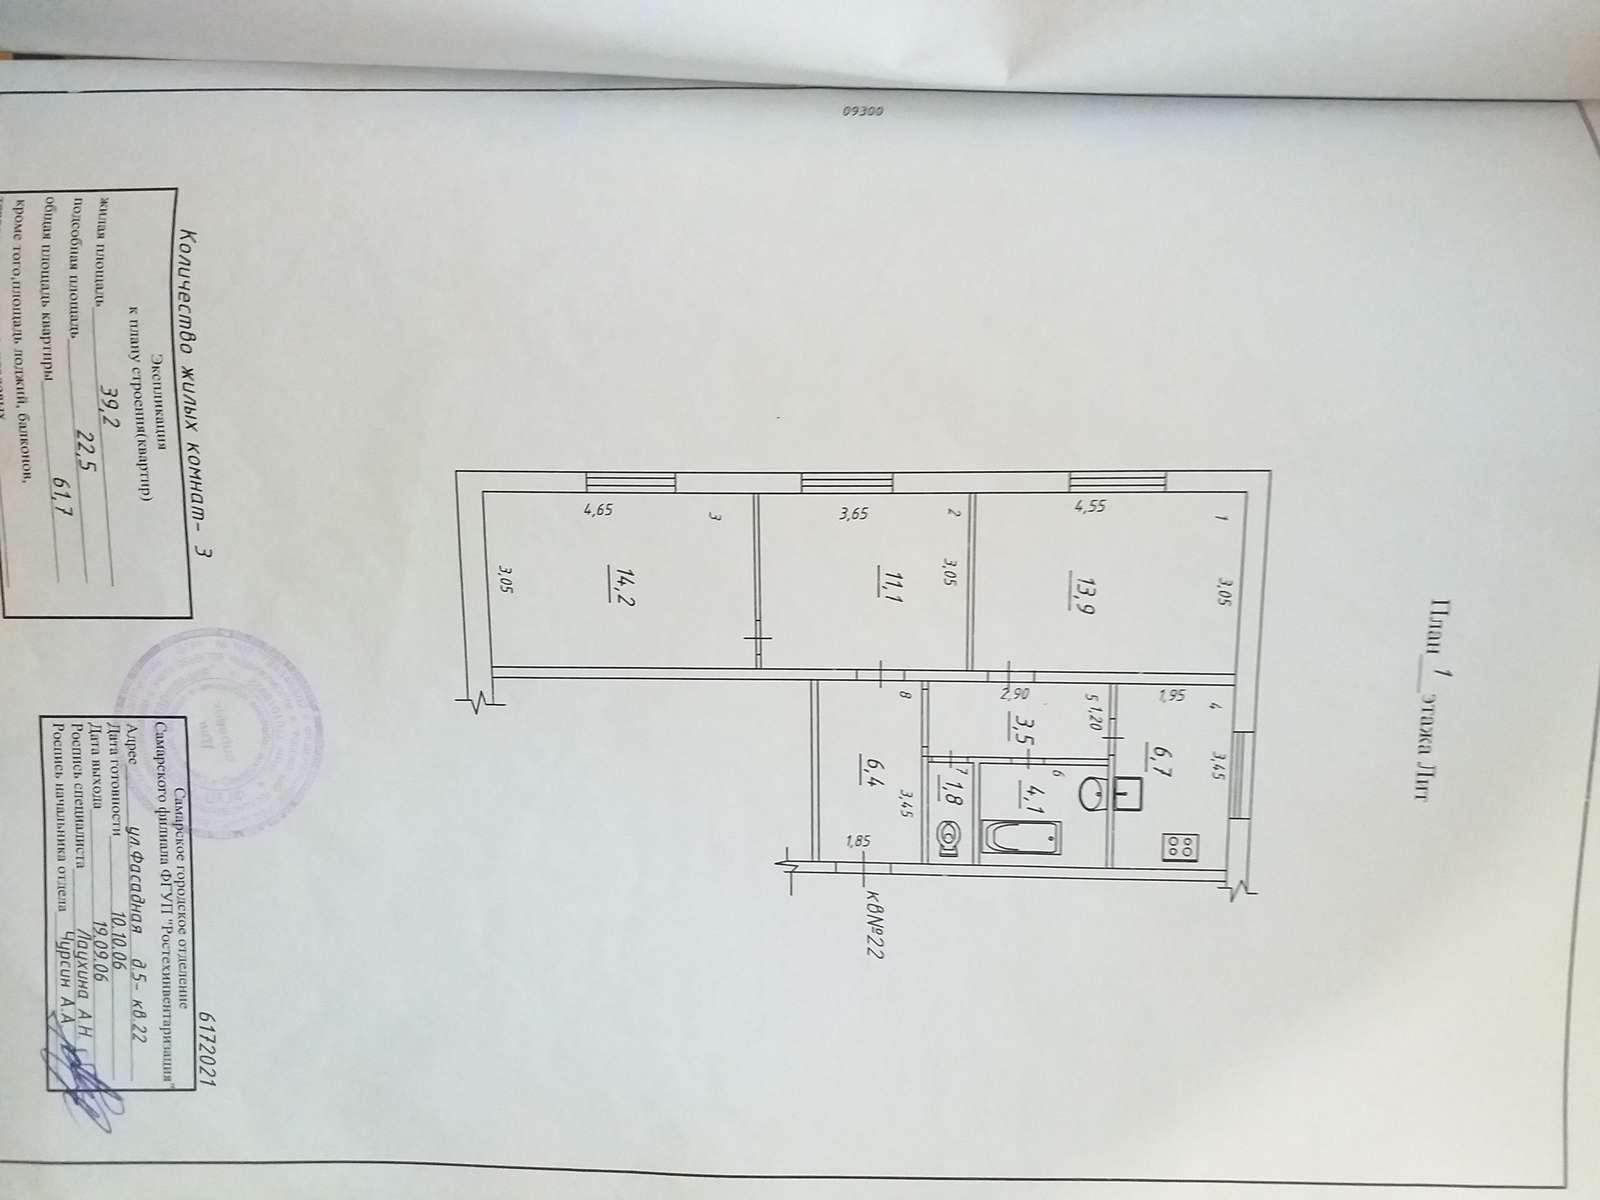 Продаётся 3-комнатная квартира 61.7 кв.м. этаж 1/3 за 4 000 000 руб